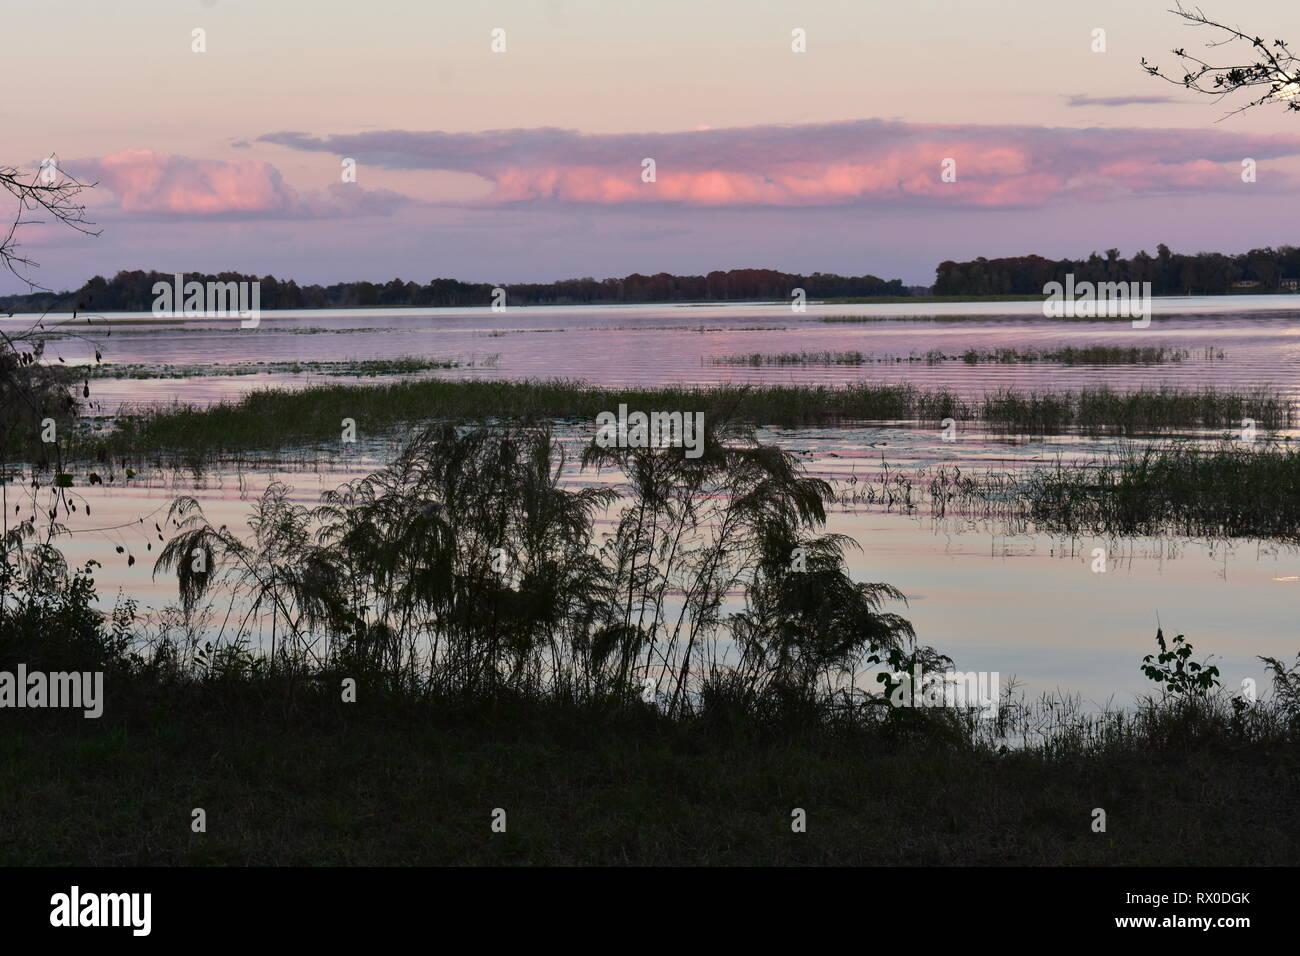 Florida sunset over lake - Stock Image